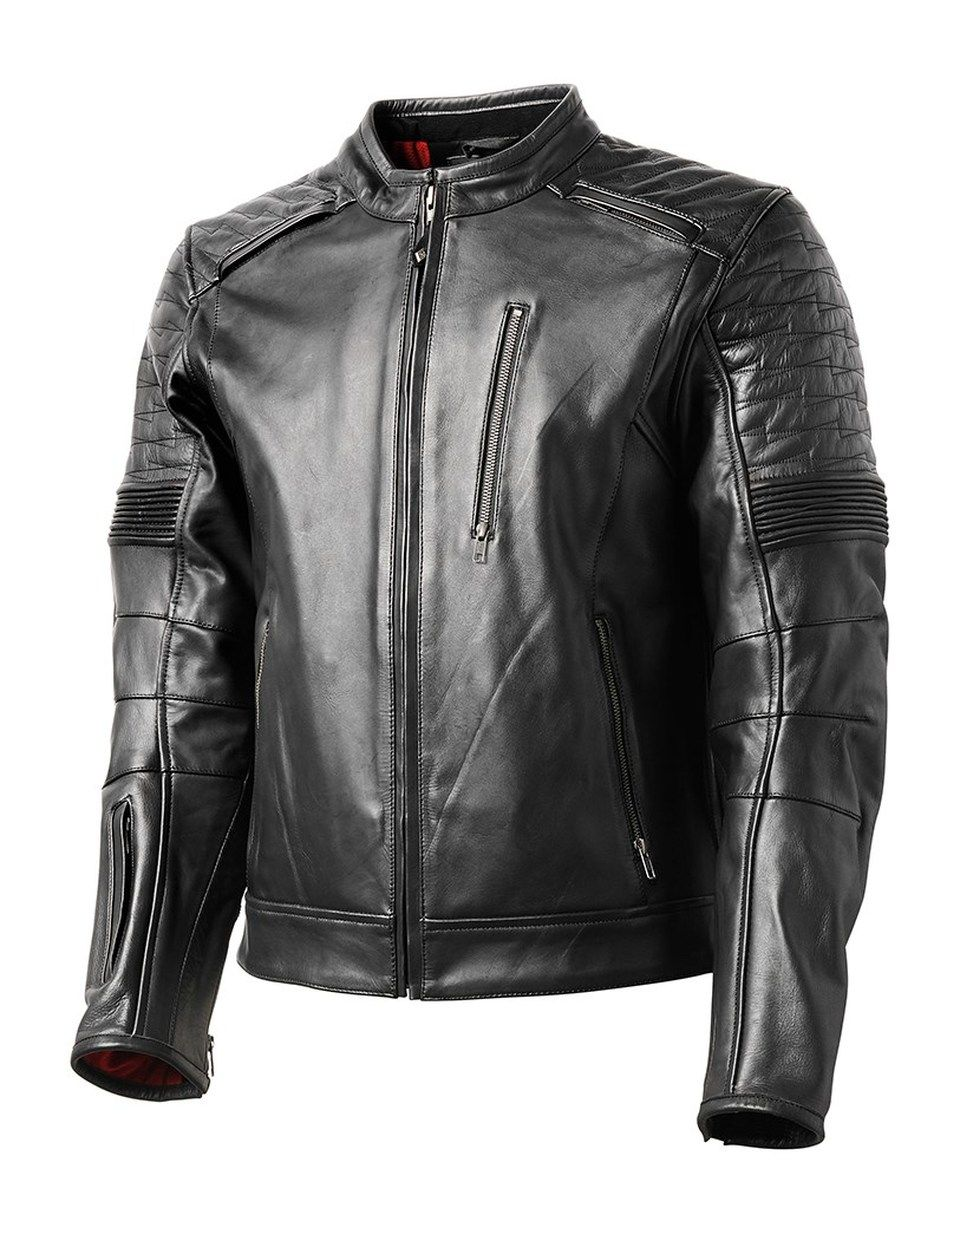 F K Luck Jacket Leather Motorcycle Jacket Motorcycle Jacket Leather Motorcycle Pants [ 1247 x 960 Pixel ]